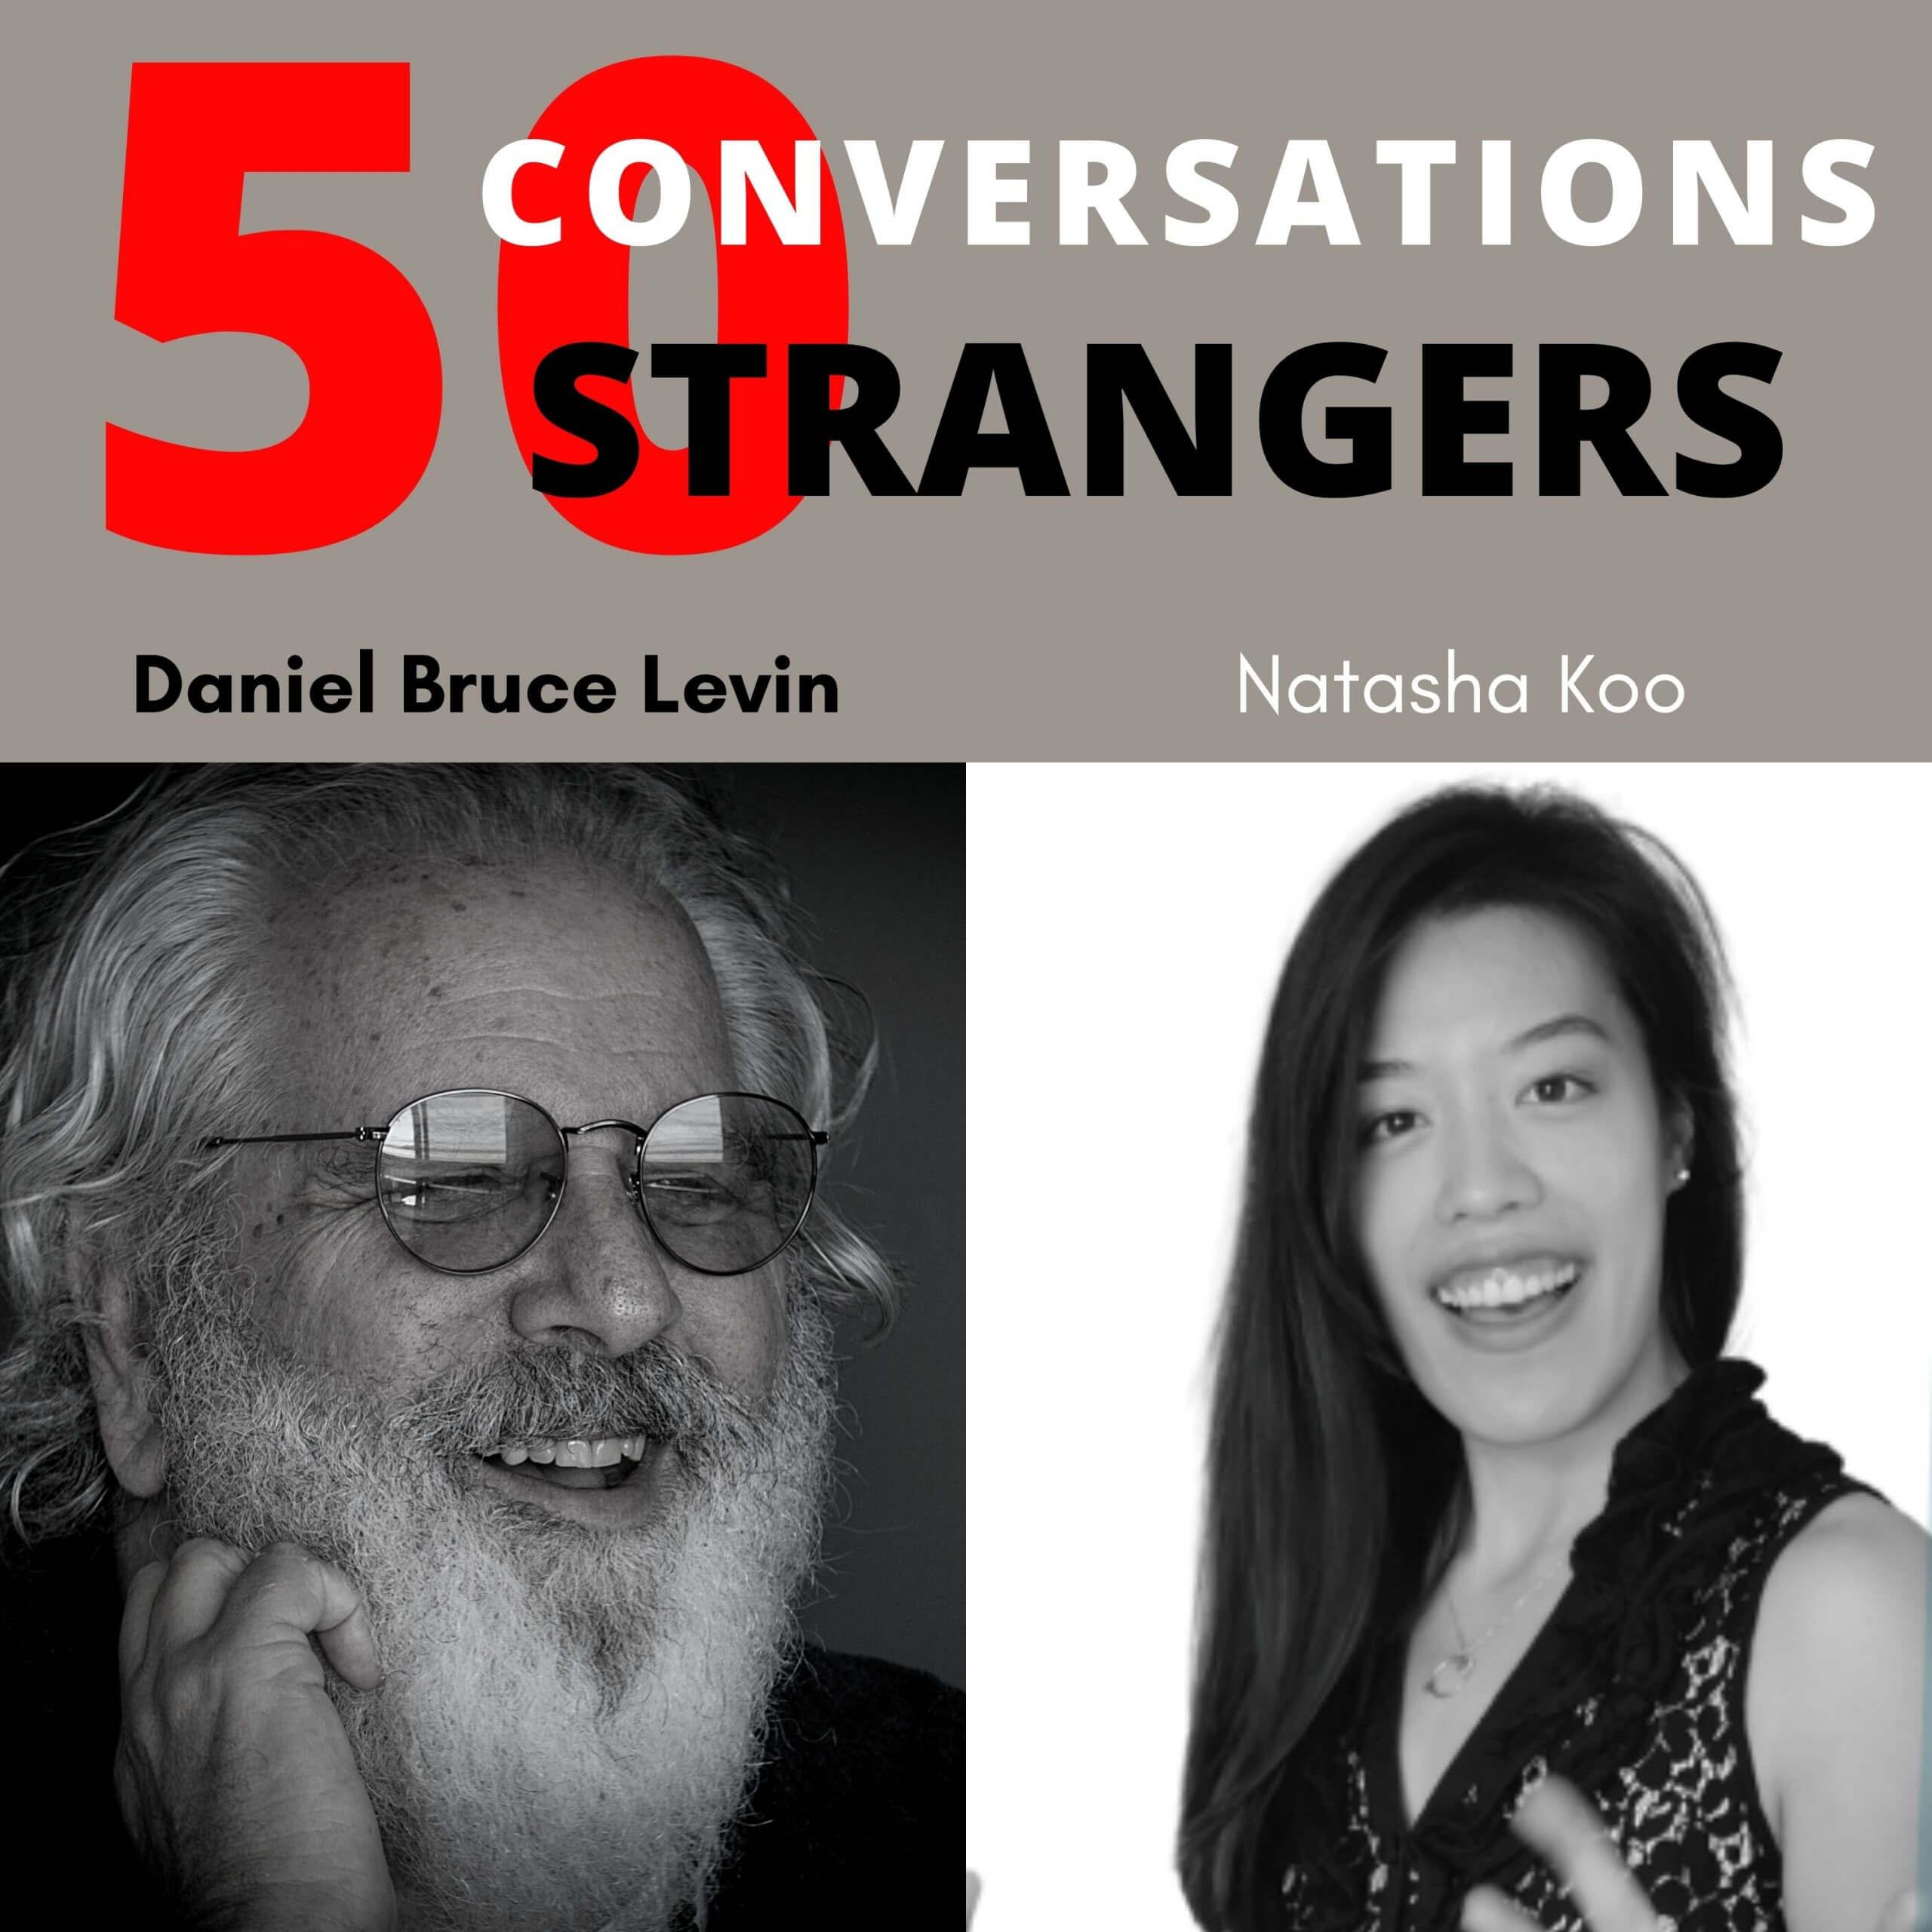 50 Conversations with 50 Strangers with Natasha Koo